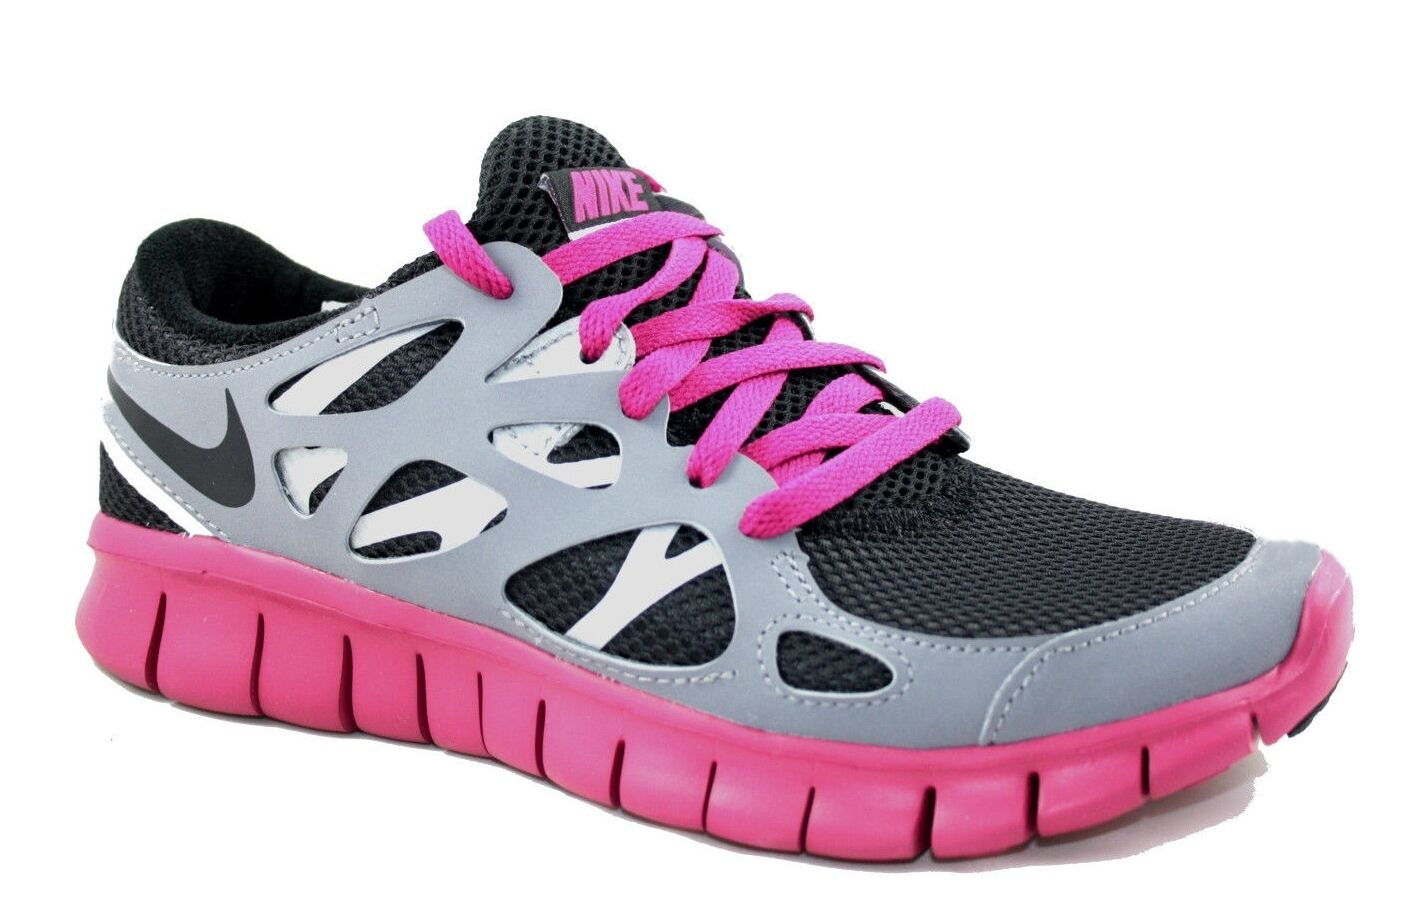 NIKE Free Run + 2 EXT Scarpe da corsa da donna Scarpe fitness leggeri scarpe da ginnastica Tg. 35